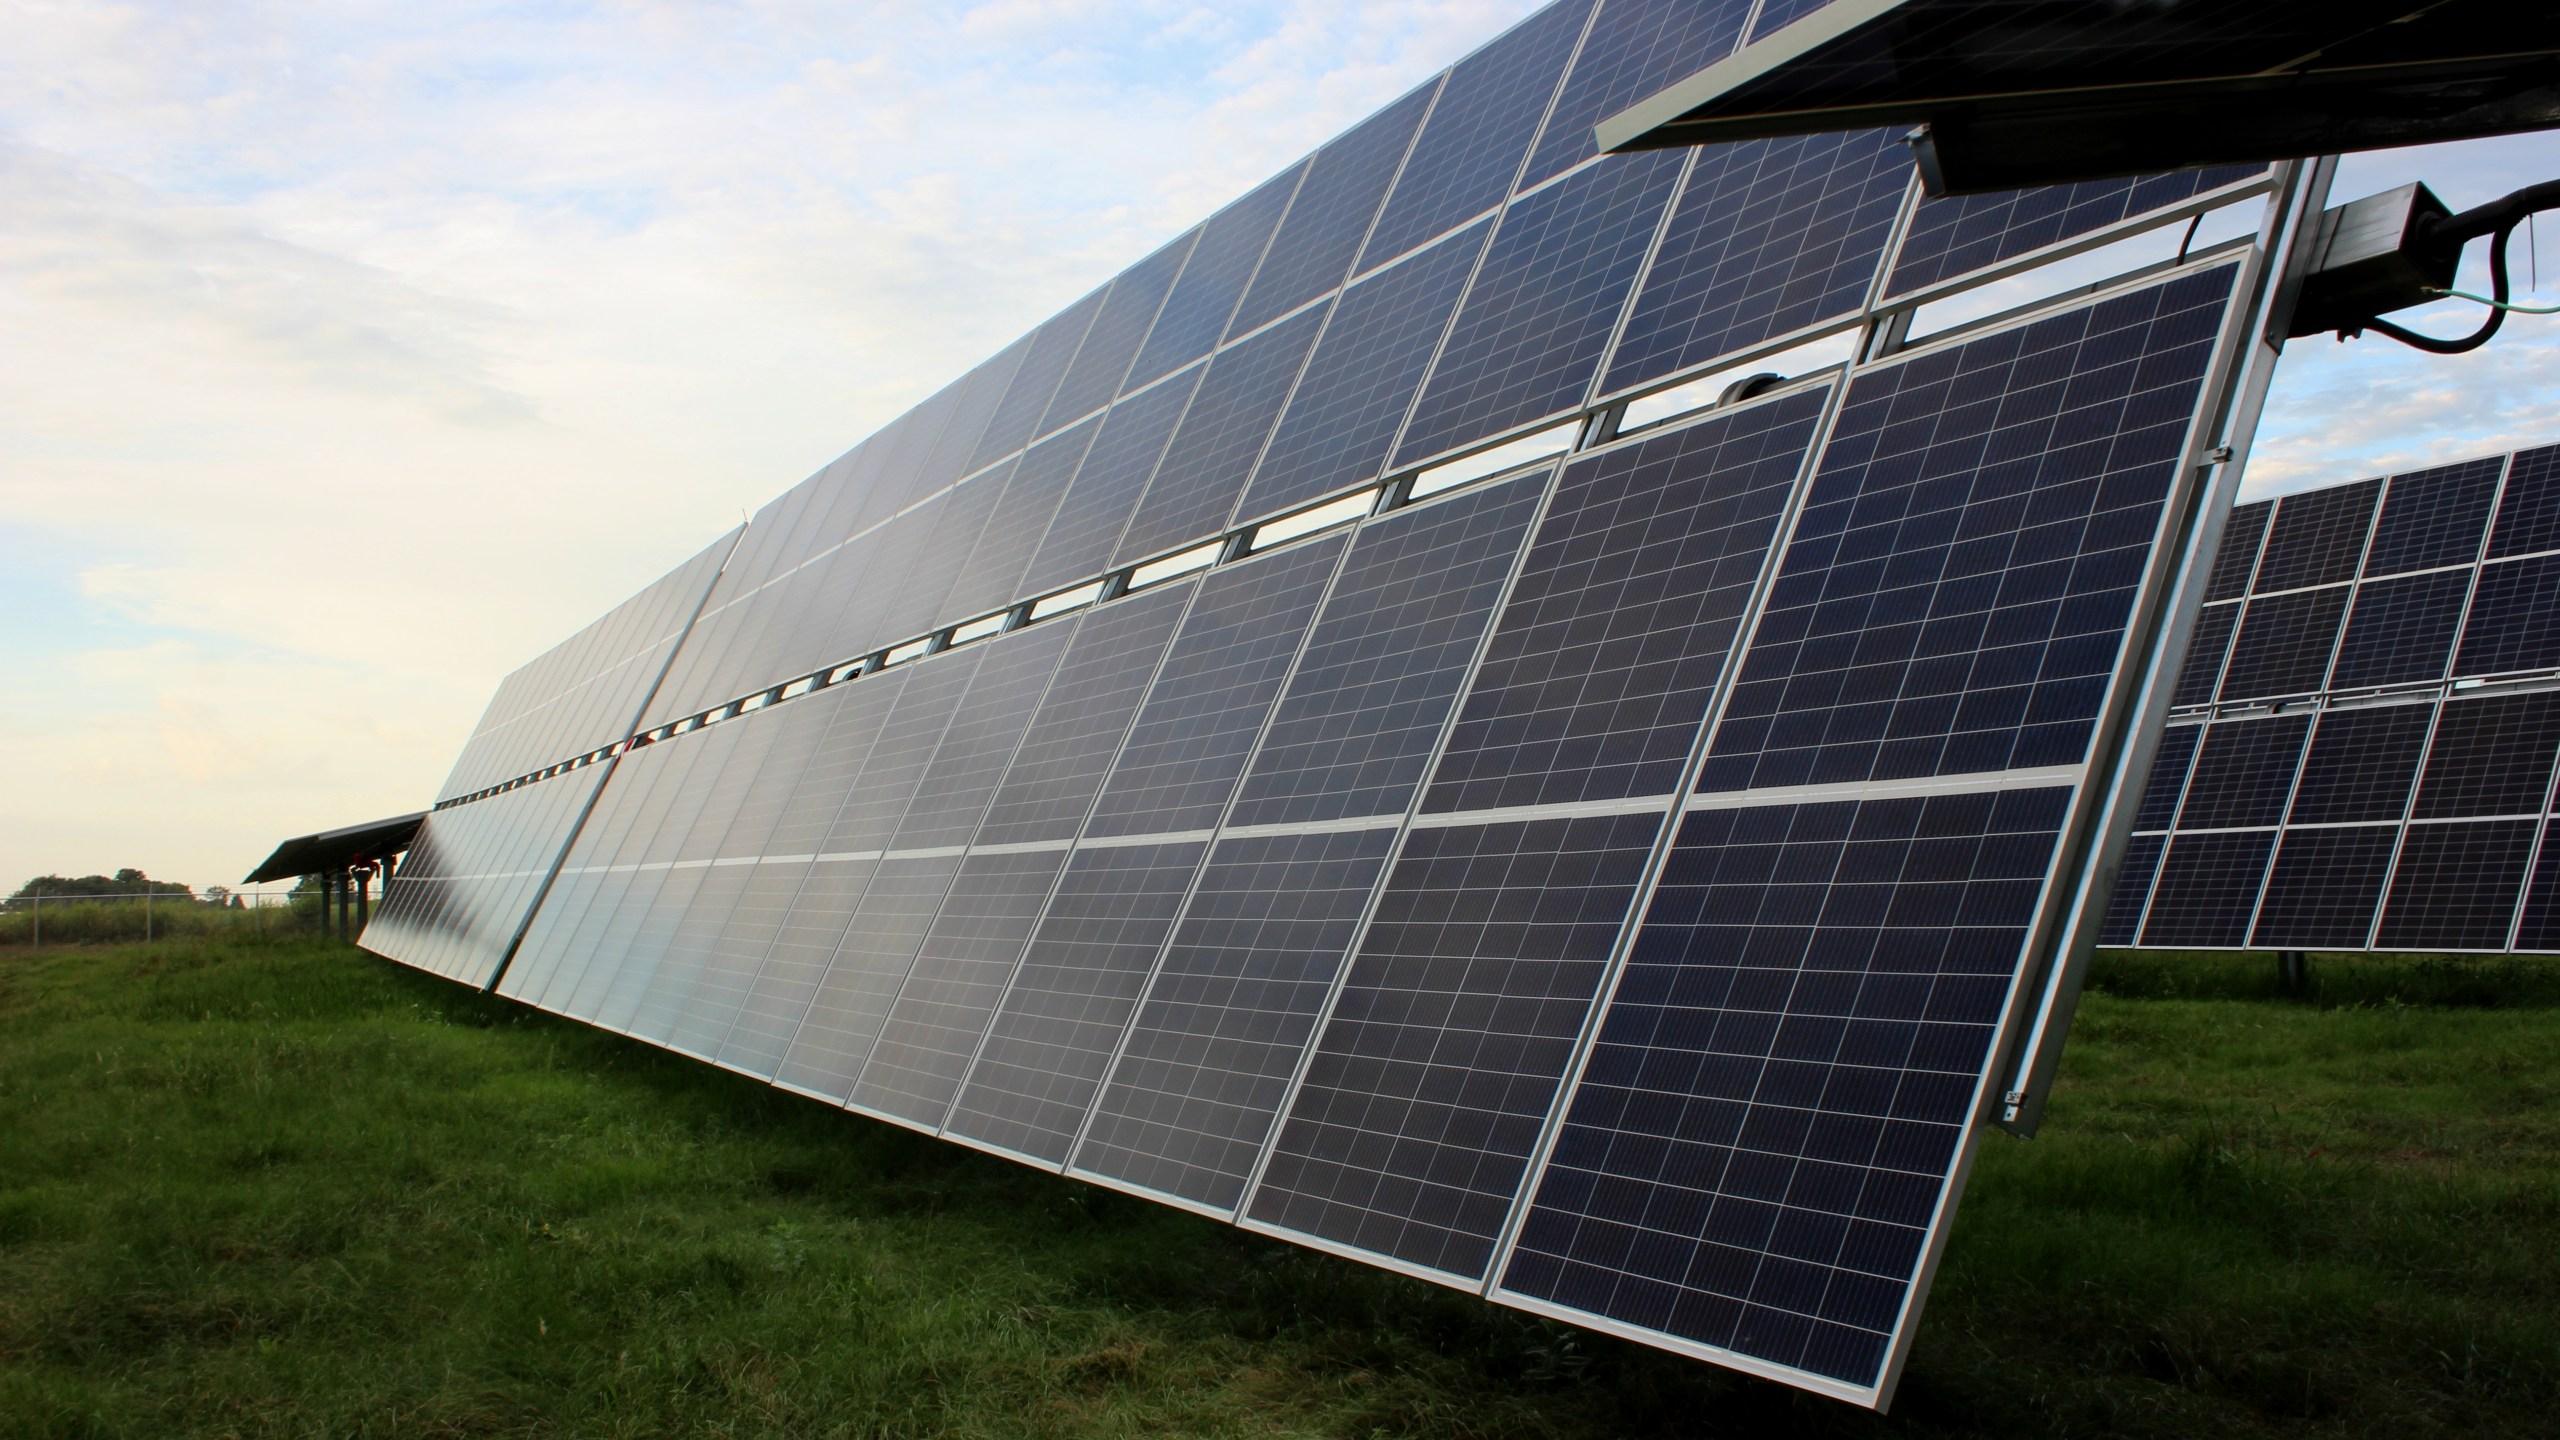 Choctaw Solar Farm tilted panels